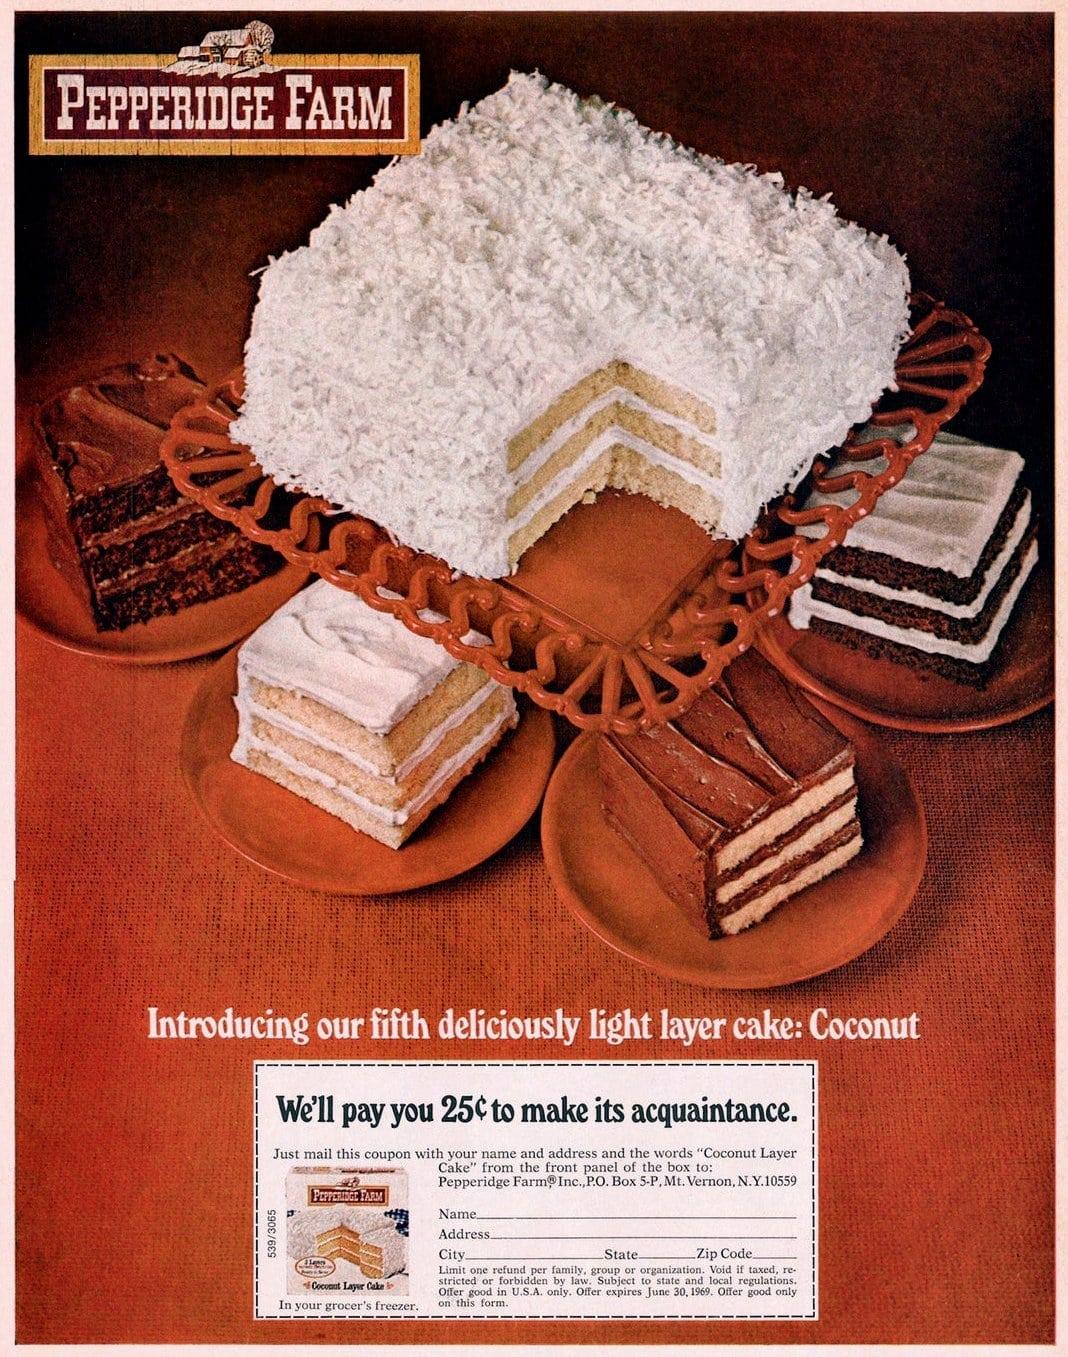 Vintage Pepperidge Farm Coconut Layer Cake (1969)